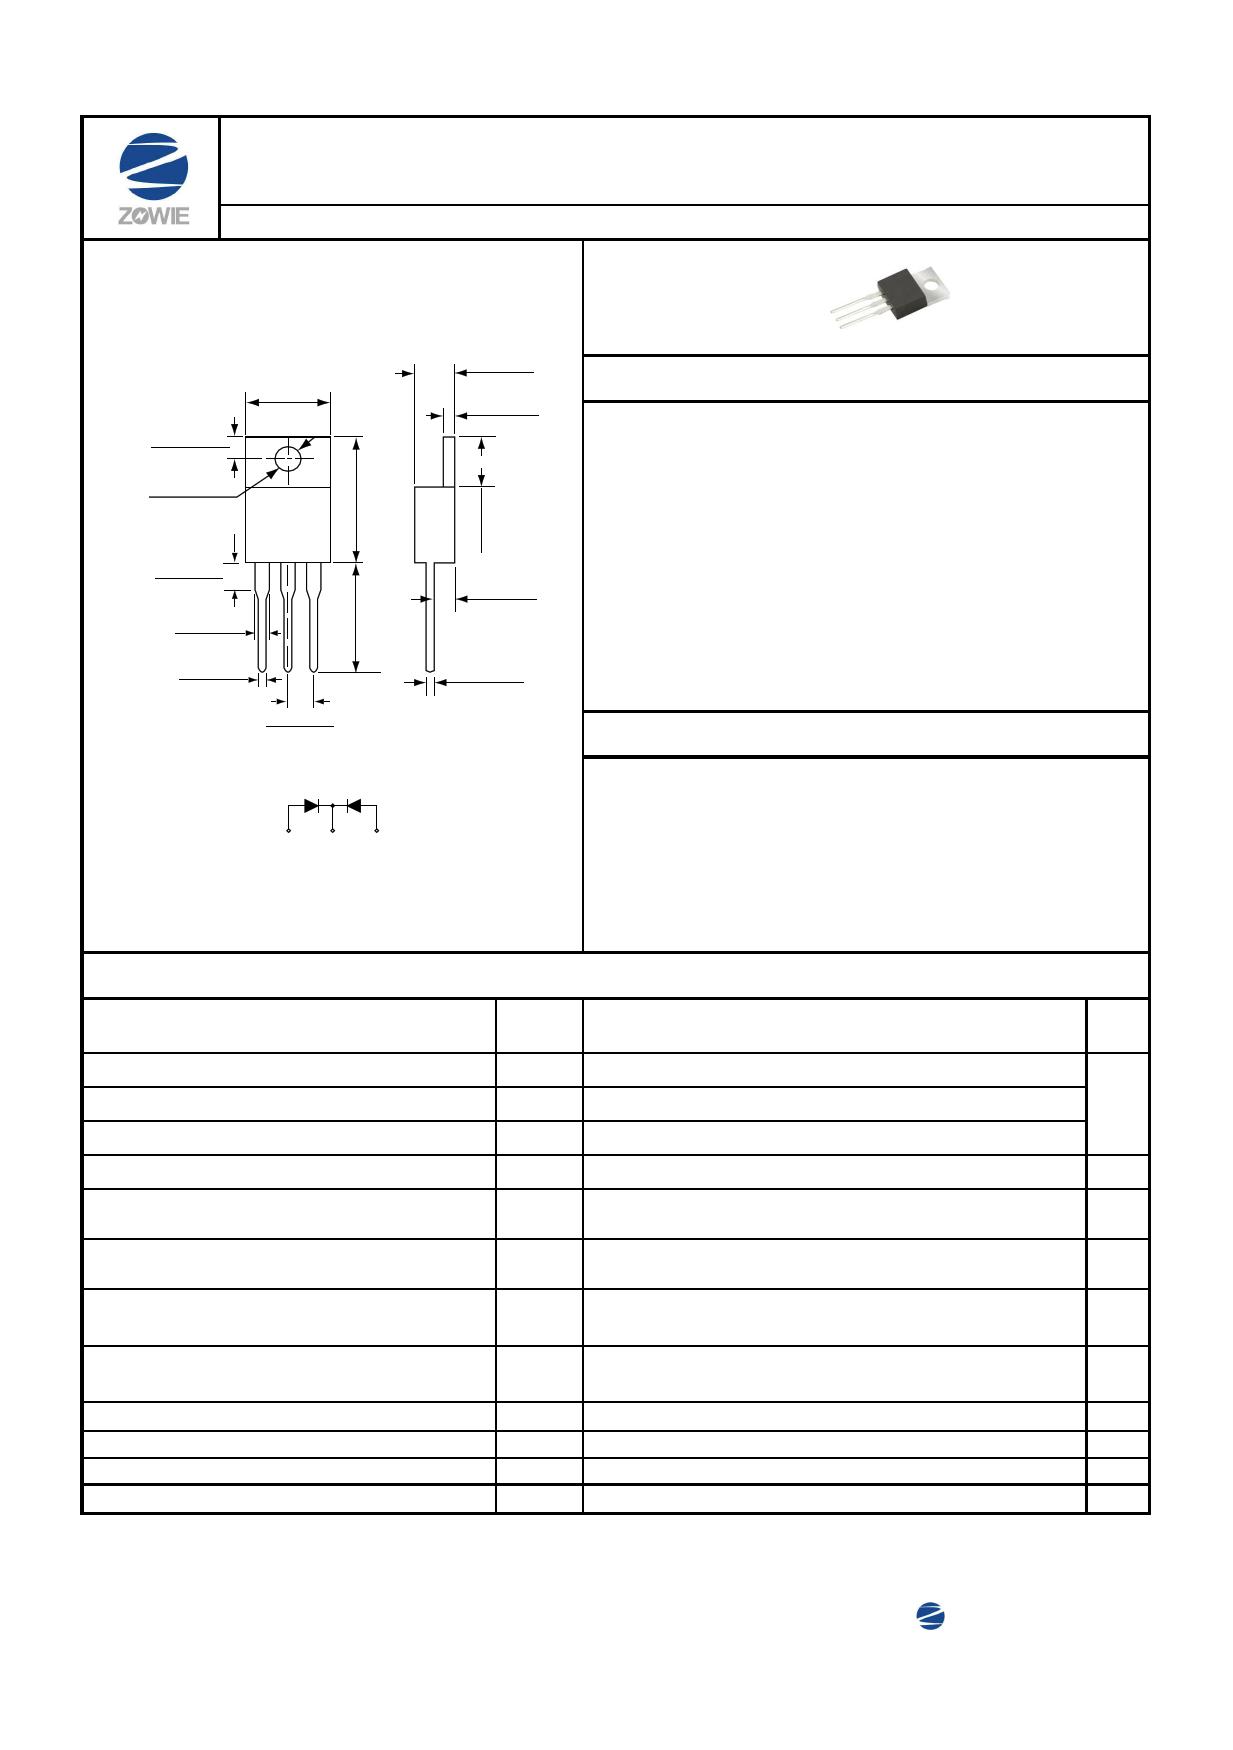 MBR10100CTSH Datasheet, MBR10100CTSH PDF,ピン配置, 機能